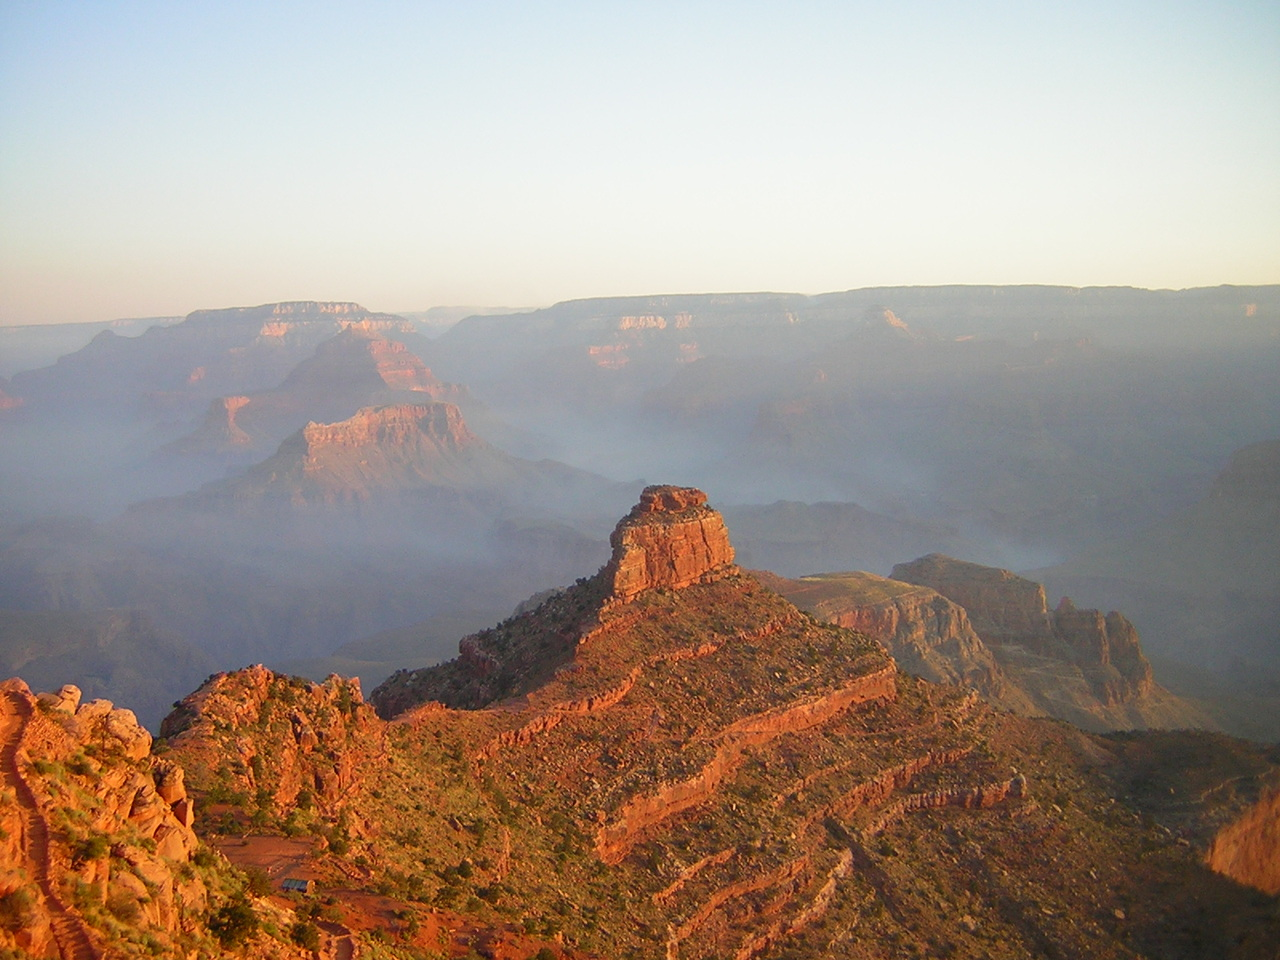 Sunrise-over-the-Grand-Canyon-by-Derrick-Palecek.jpg